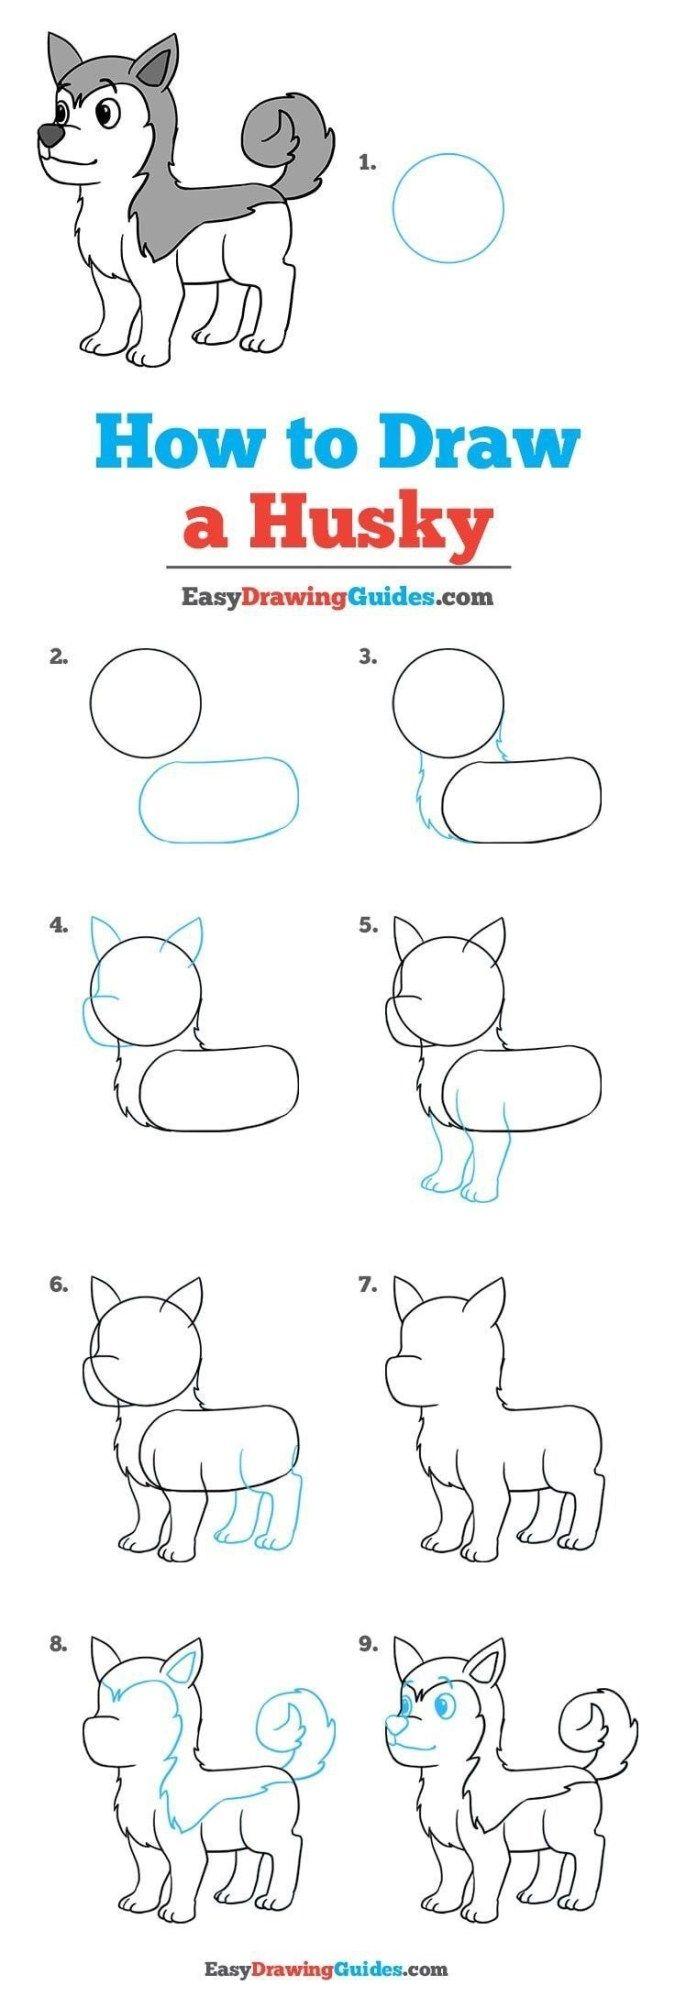 20 Cartoon Animal How To Drawings   Drawing tutorial easy, Drawing ...